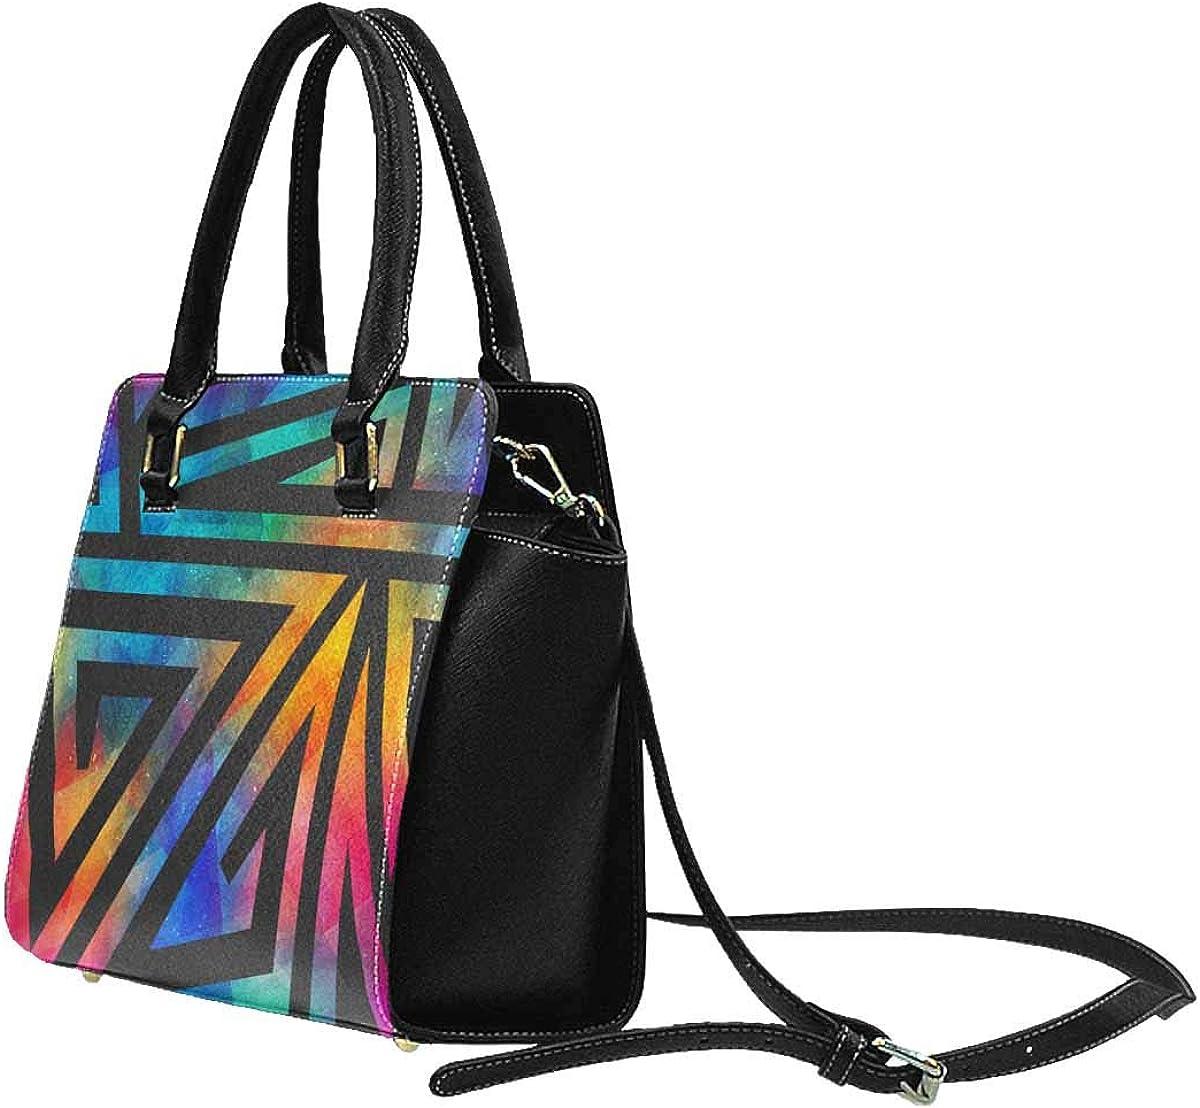 INTERESTPRINT Grunge Geometric Pattern Purses and Handbags Shoulder Bag for Women Ladies Girls